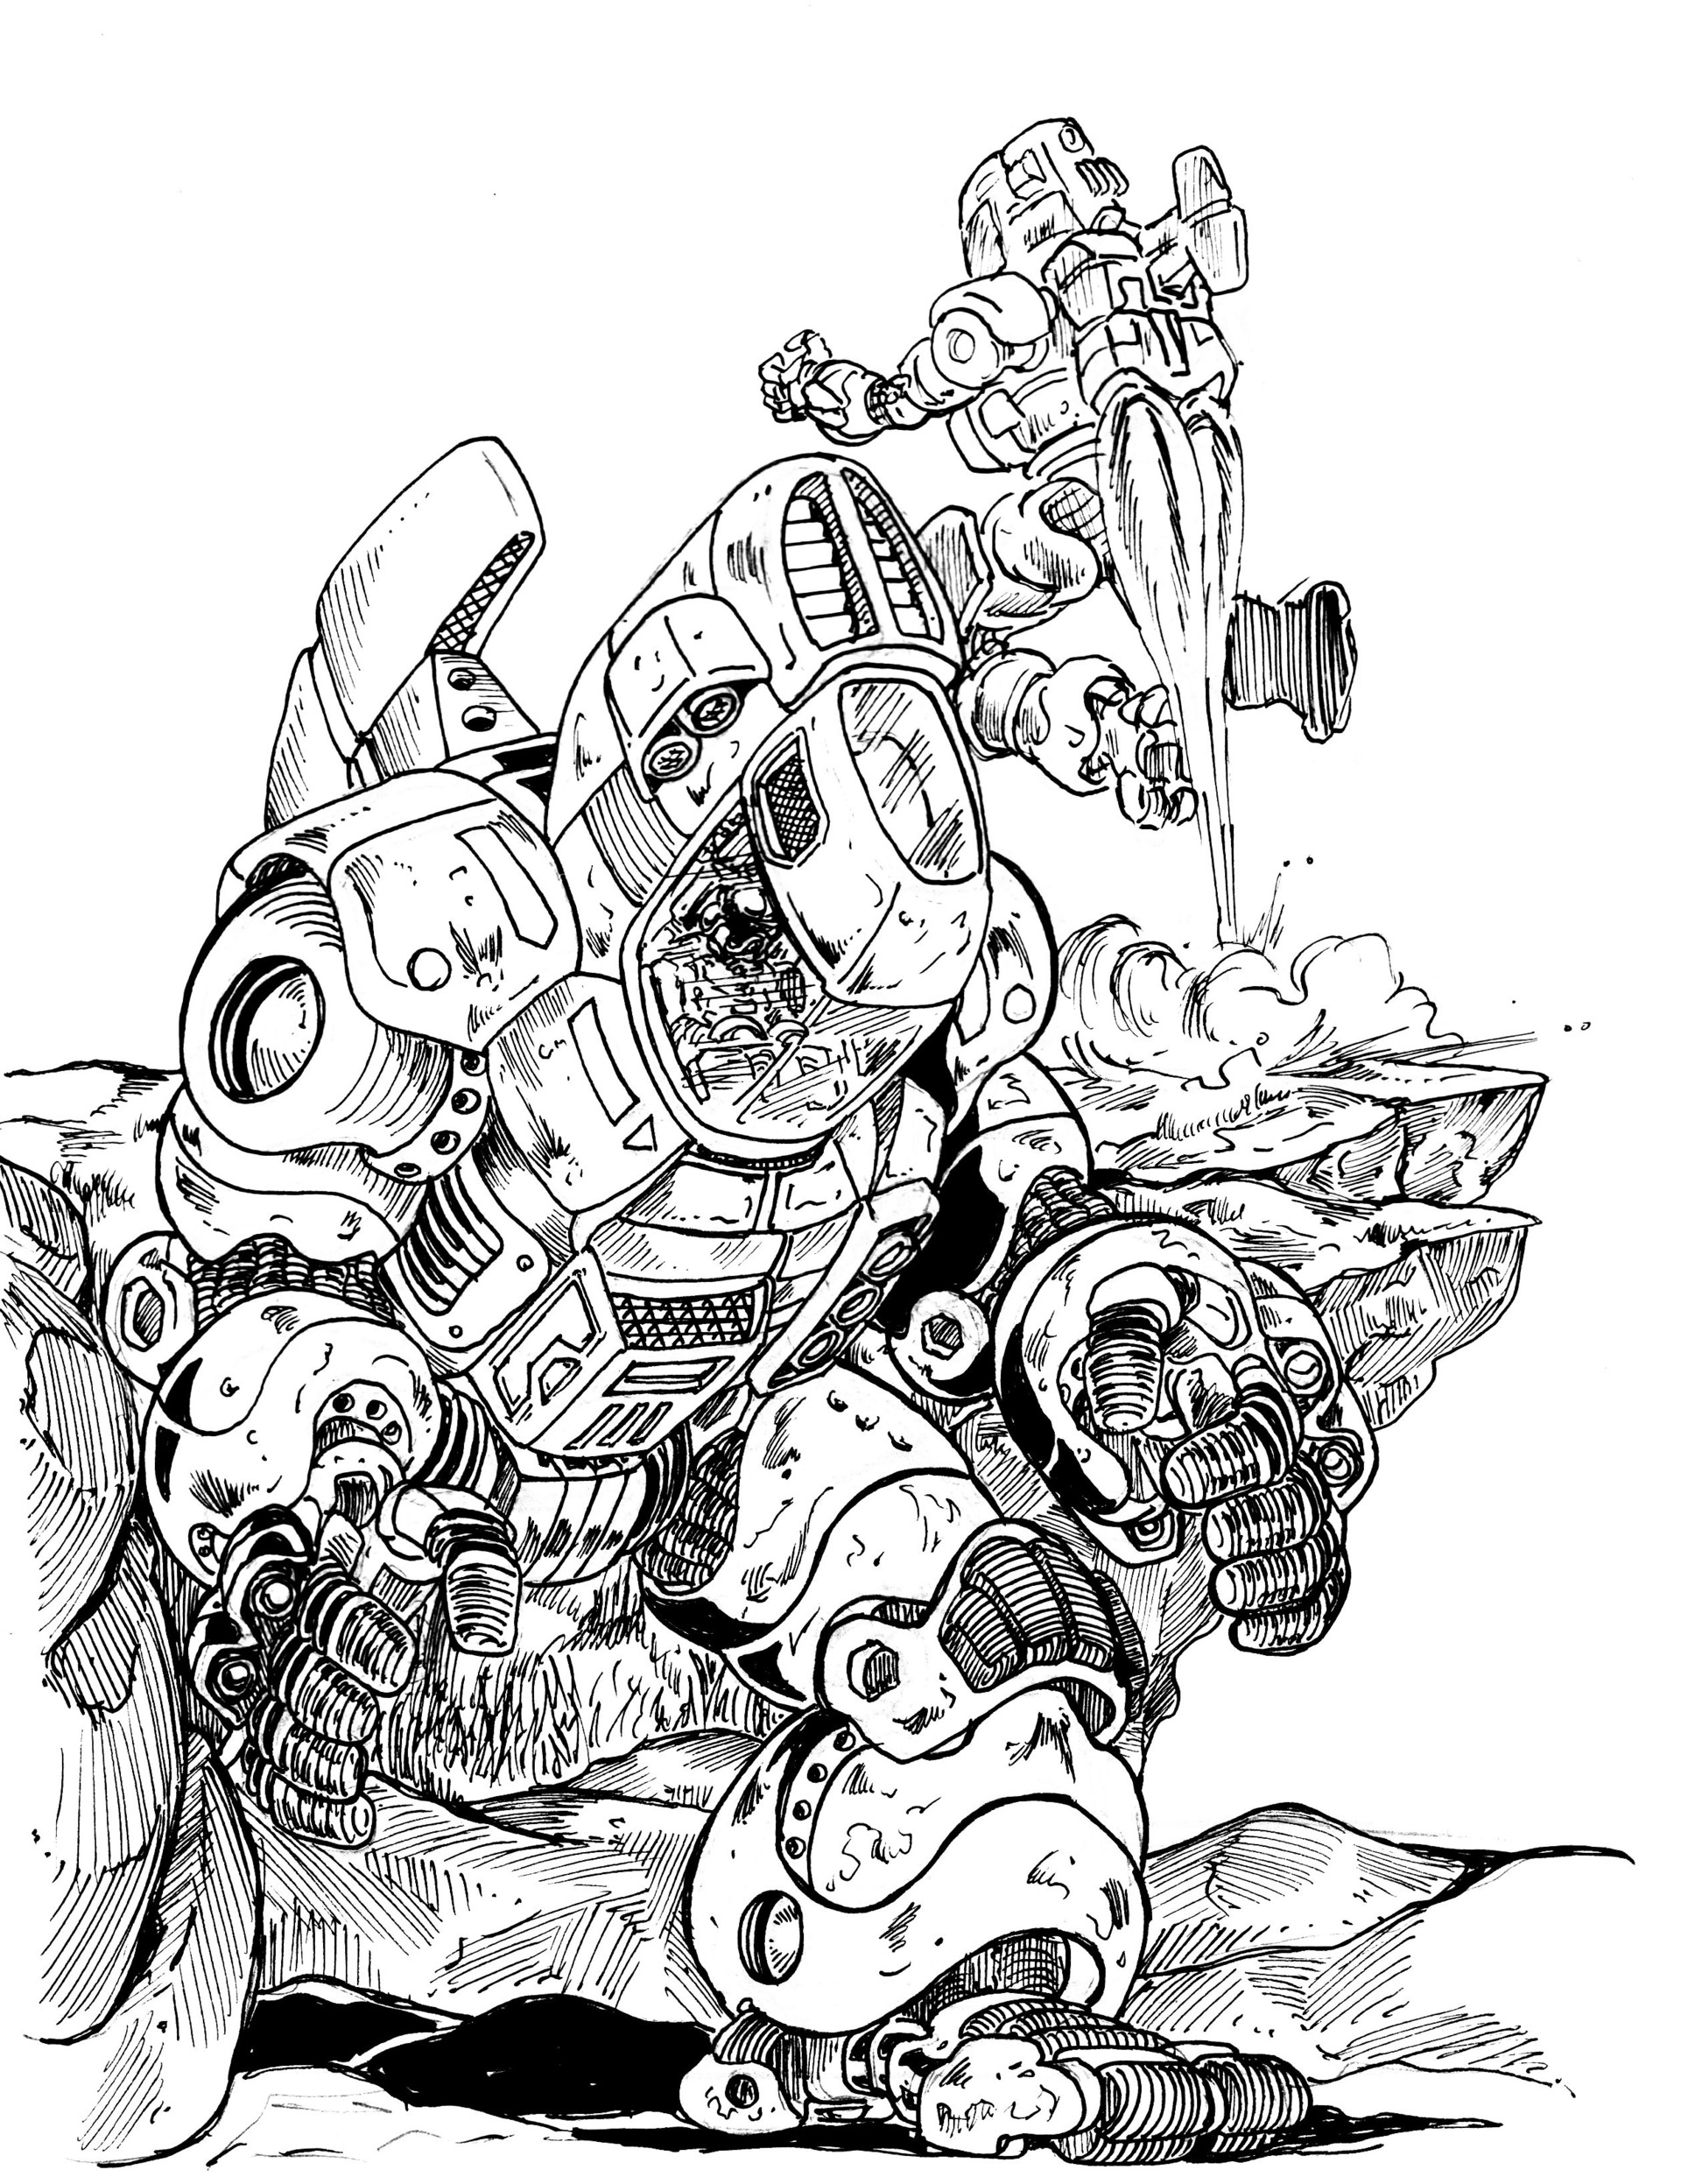 Vincent bryant inktober 16 heavy metal mech